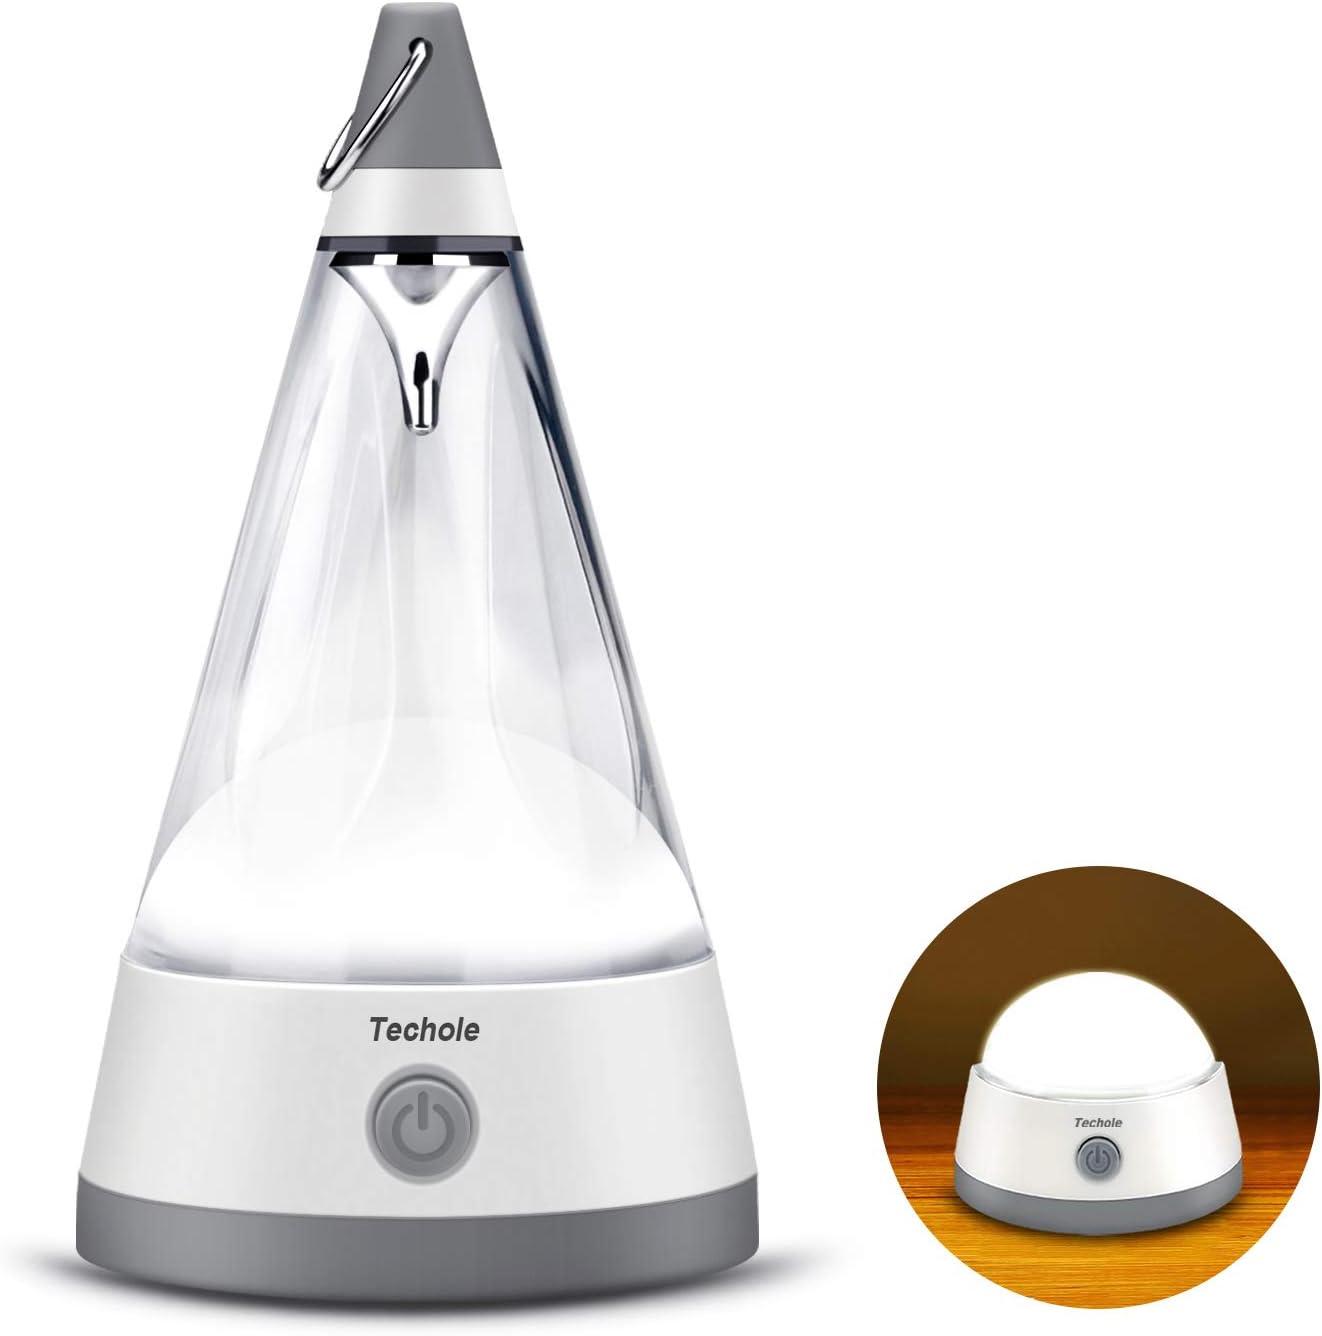 2 x LED MOTION SENSOR HANGING SAFETY NIGHT LIGHTS POWER CUT LIGHT CAMPING LIGHT